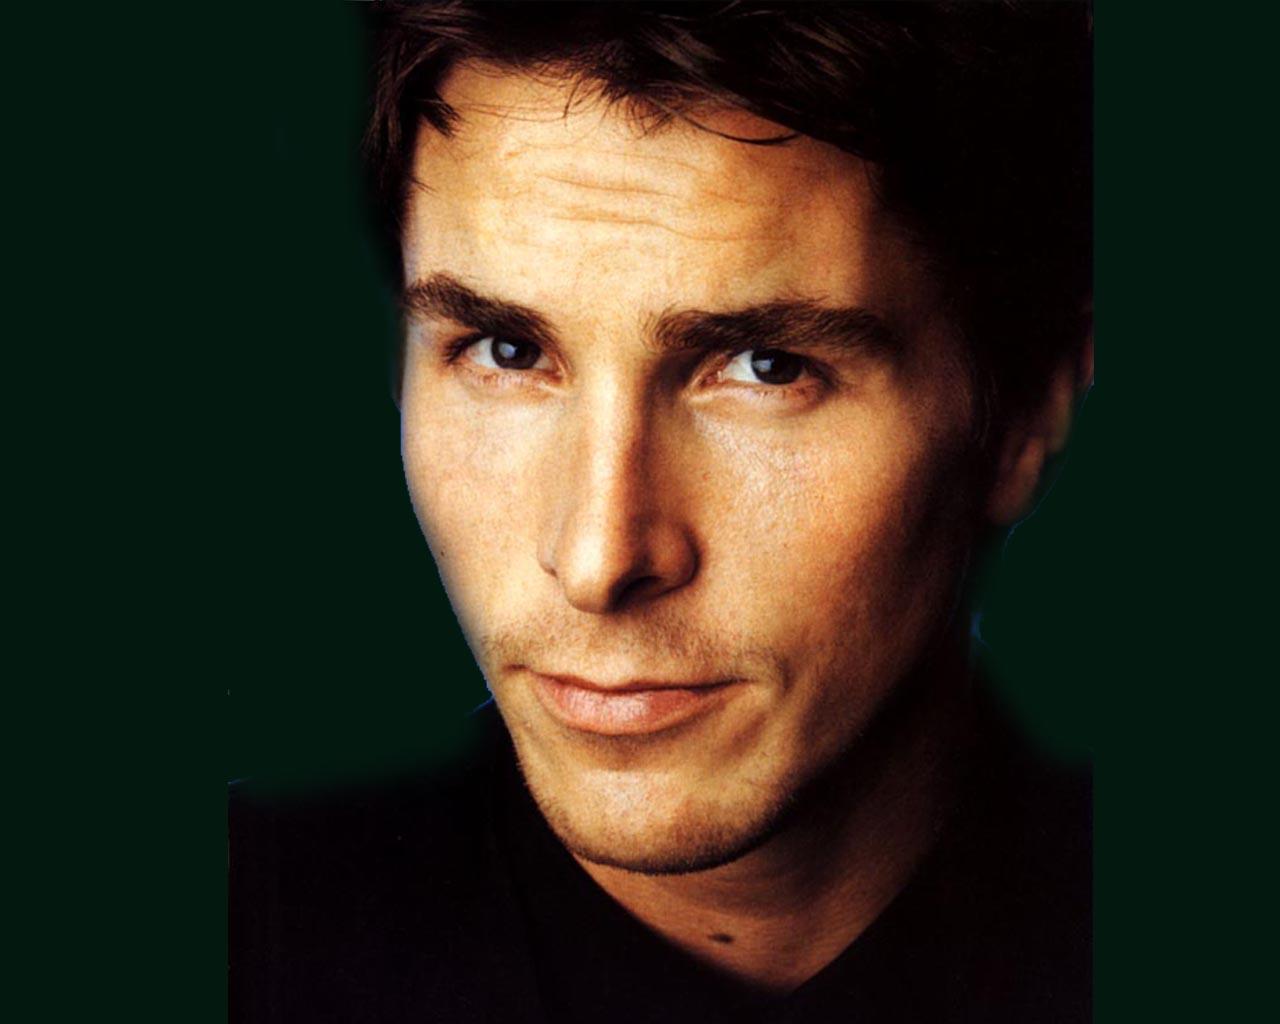 Hair Styles & Haircuts: Christian Bale's Film History